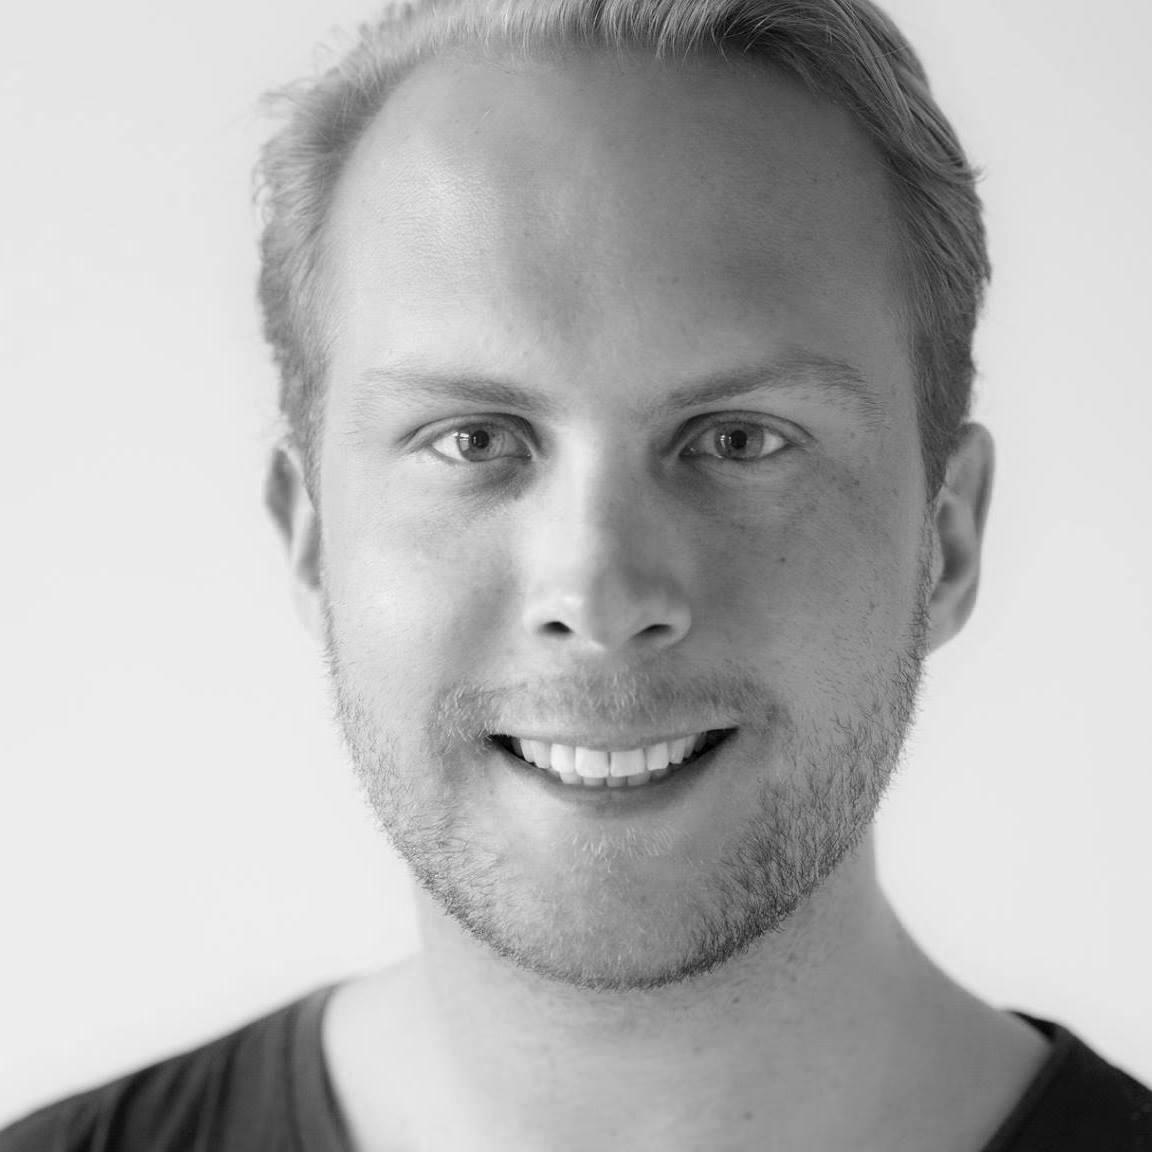 Rasmus Törnblom